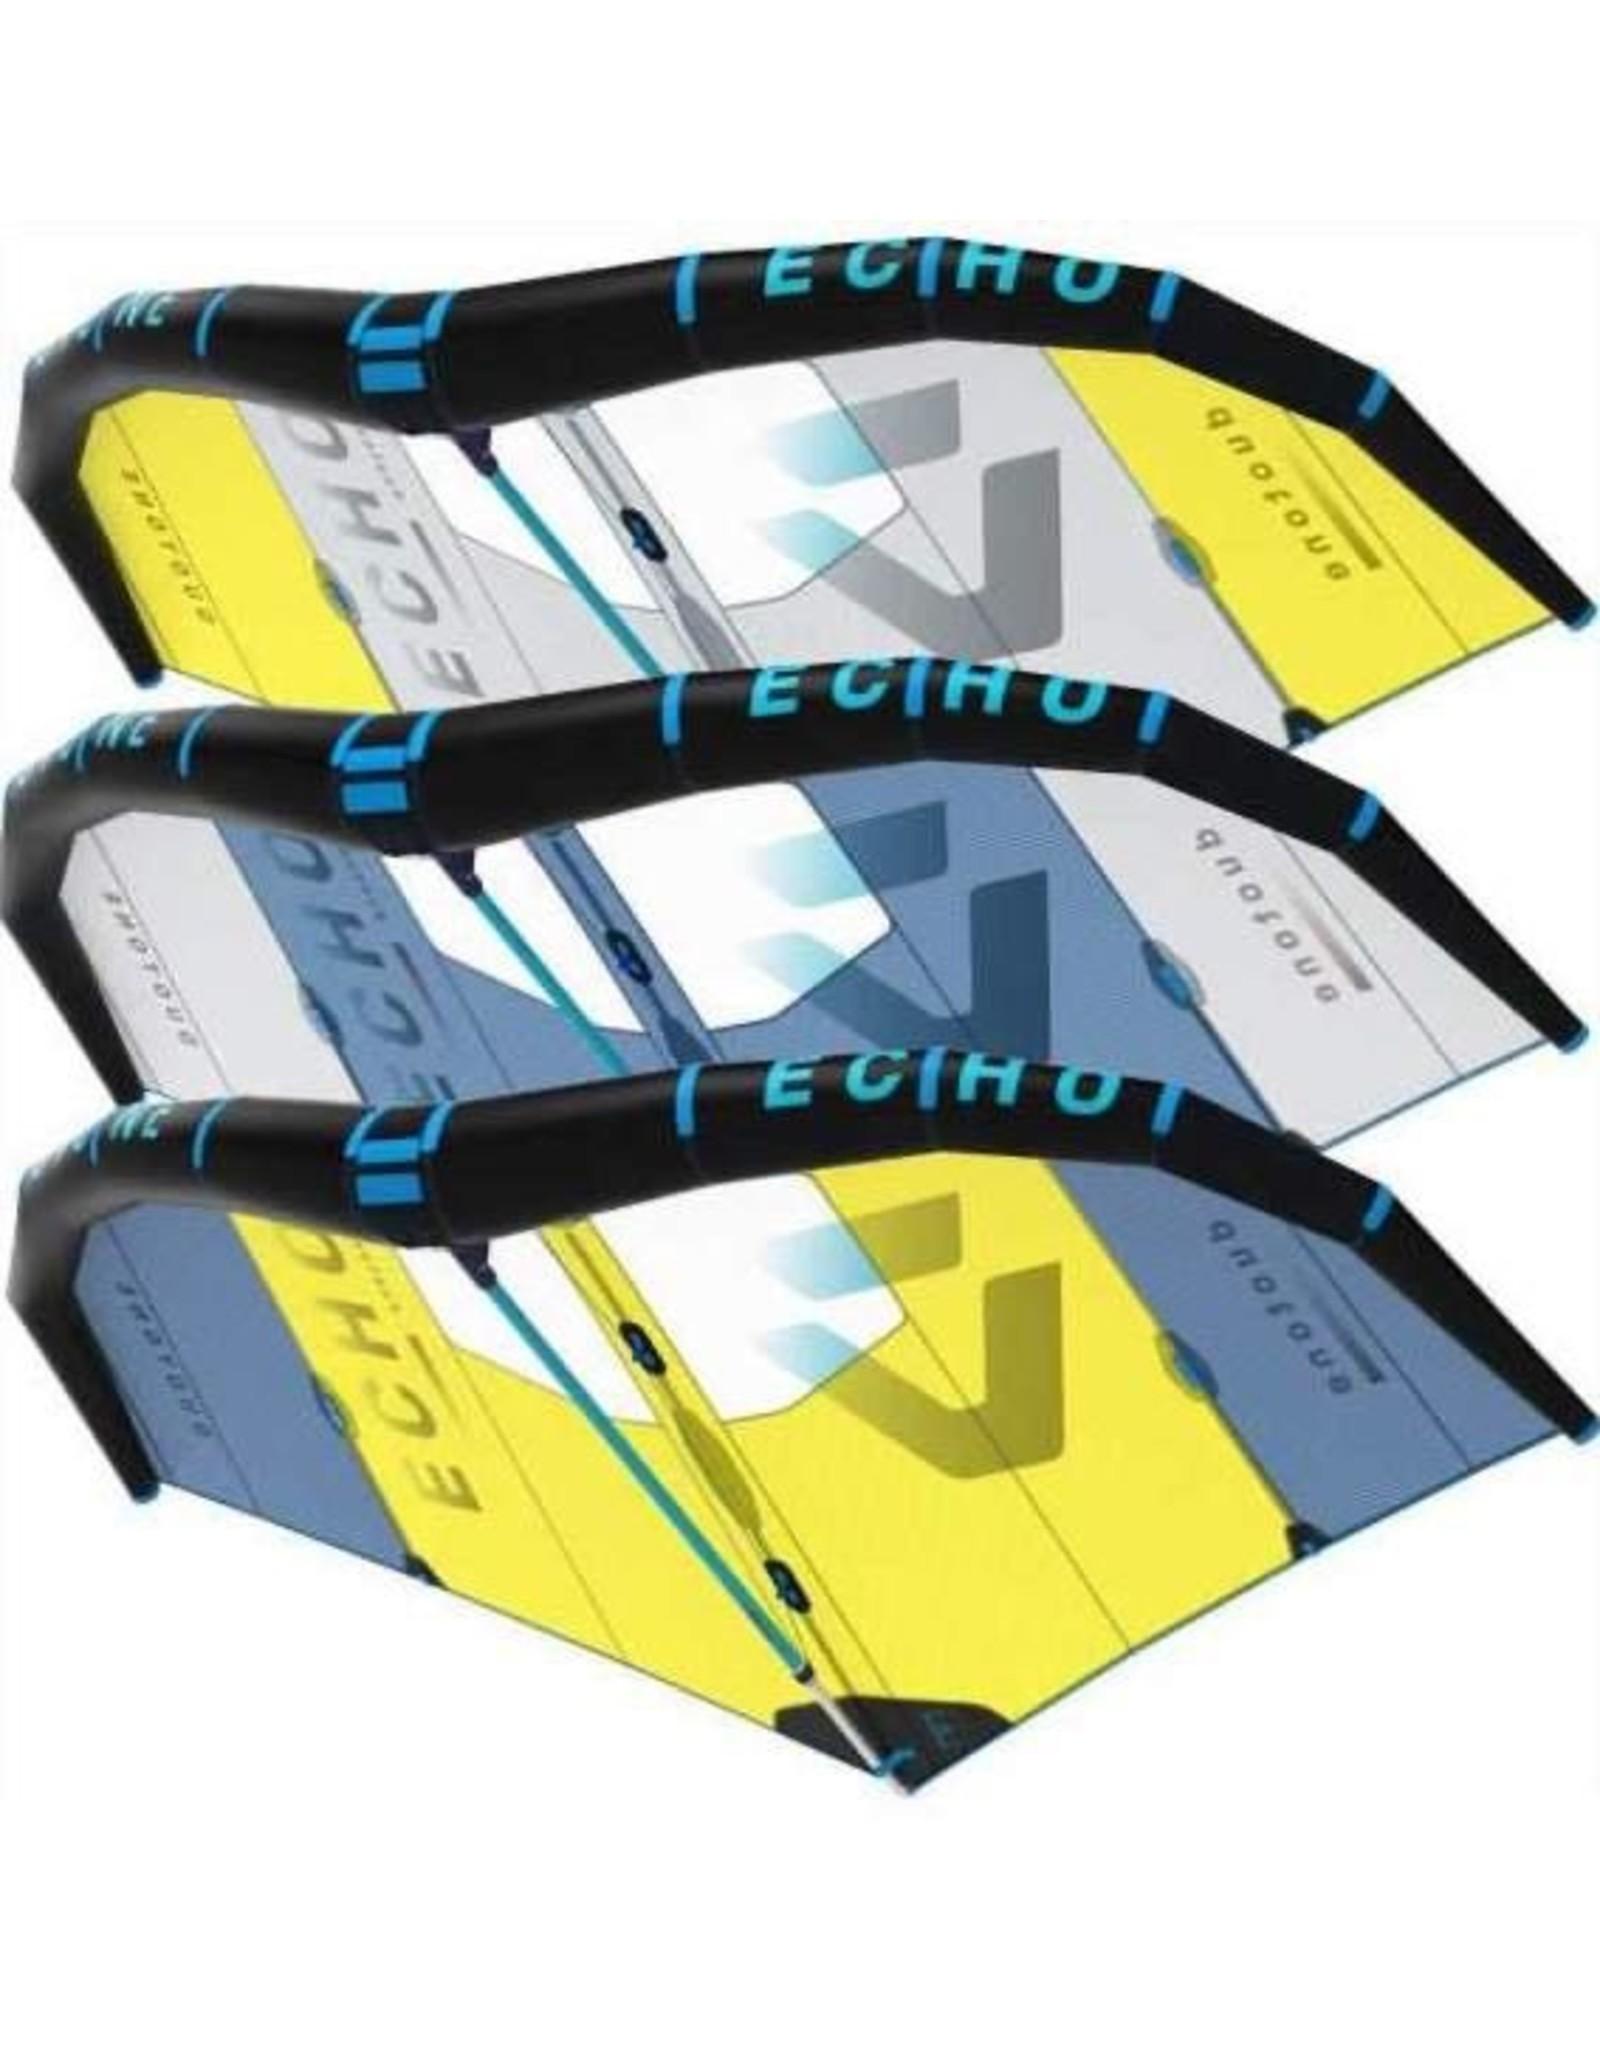 Duotone Duotone Foil Wing Echo 4m2 (kun winge)